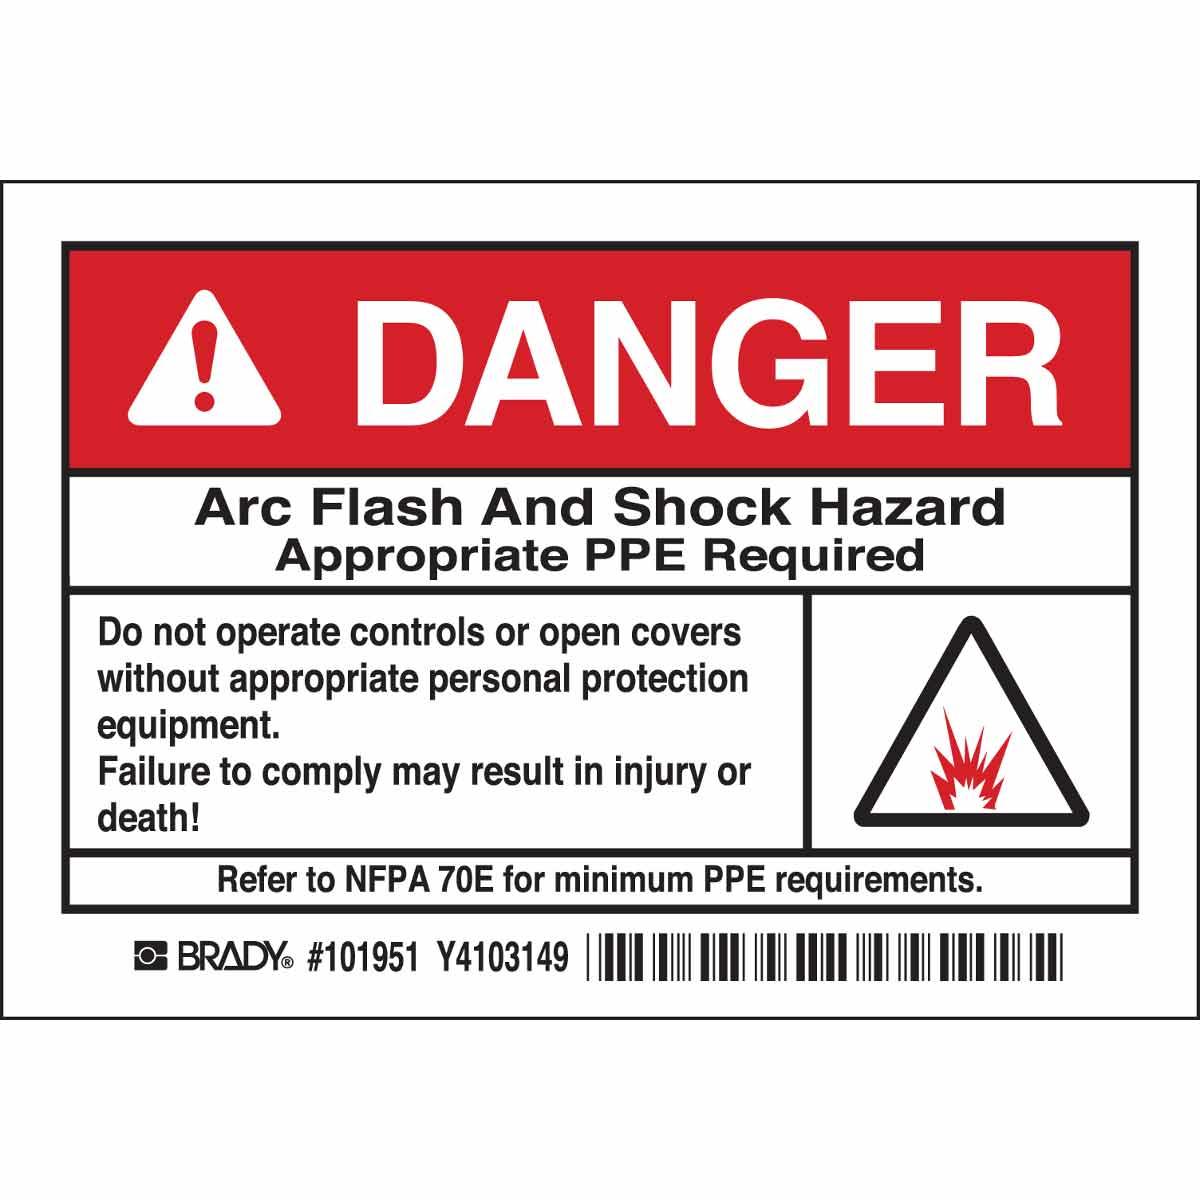 Brady part 101951 danger arc flash and shock hazard for Danger arc flash labels